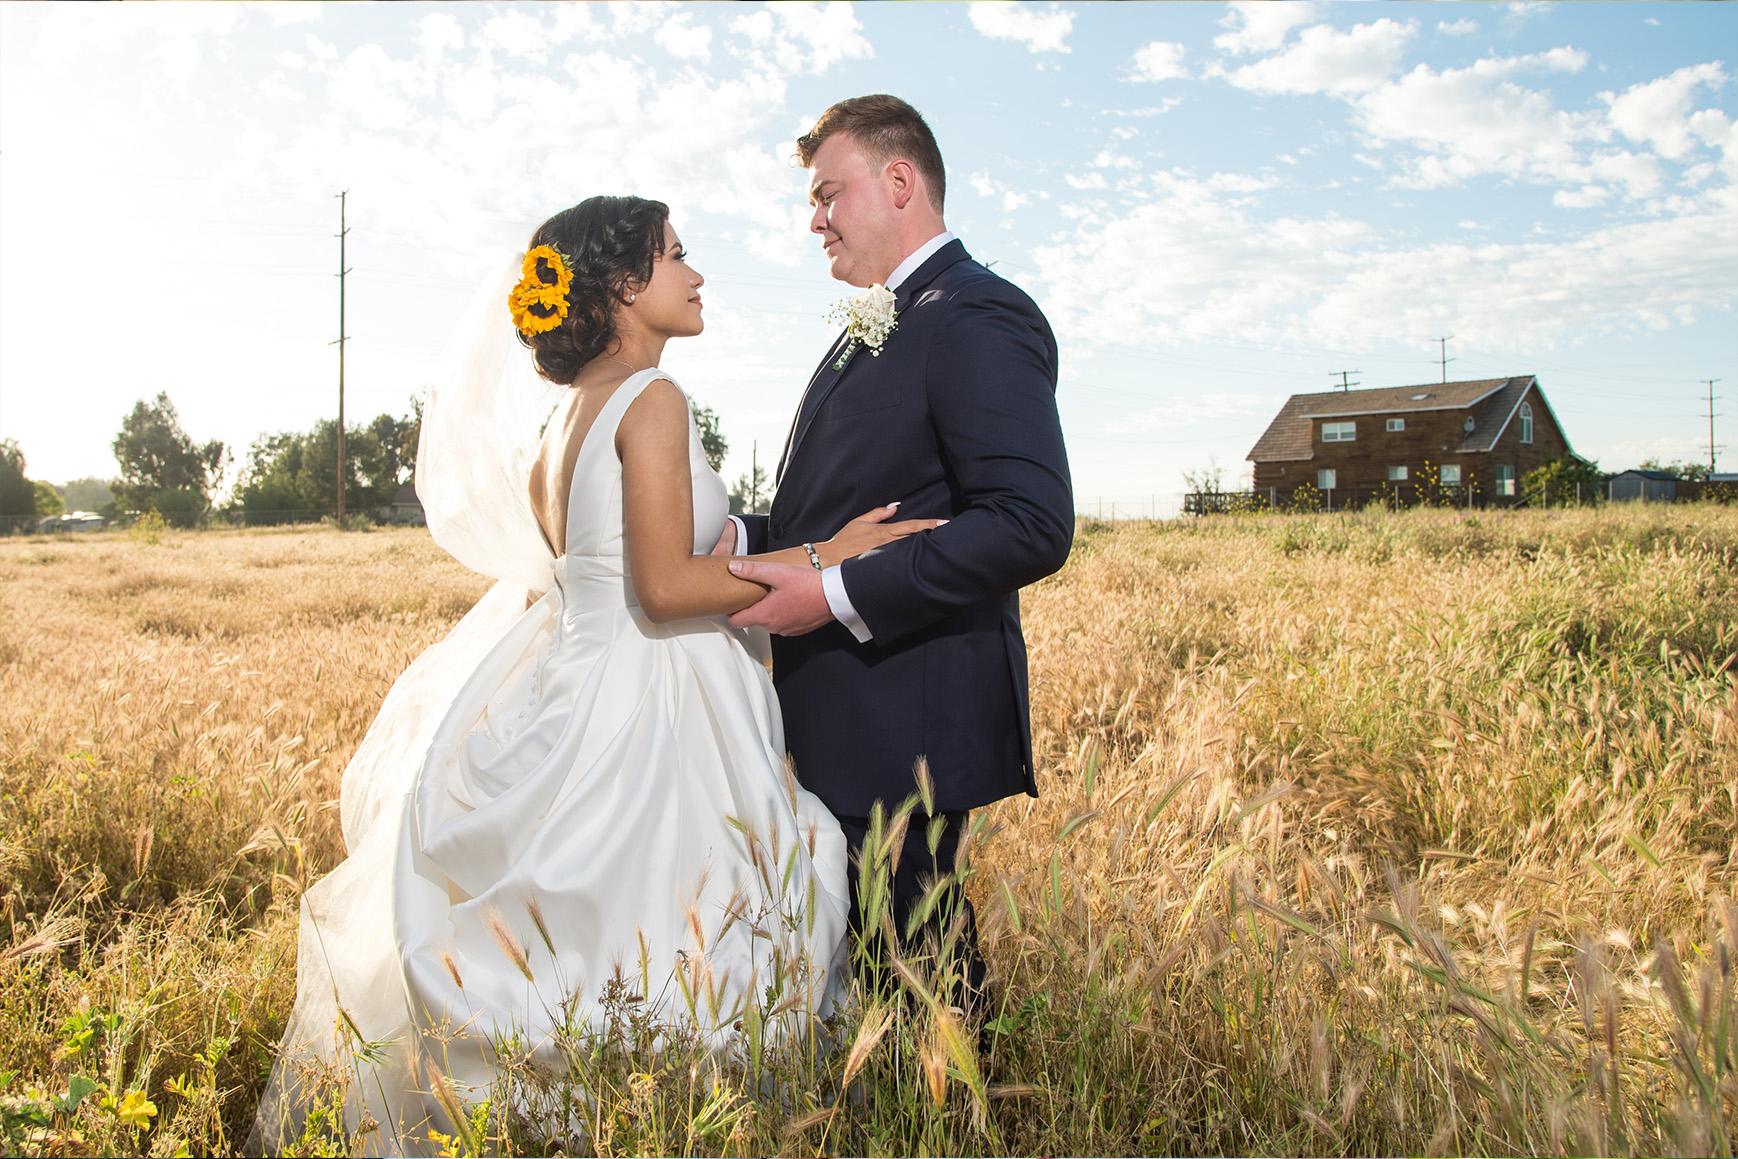 Couple in the field - Orchard - Menifee, California - Riverside County - Wedgewood Weddings